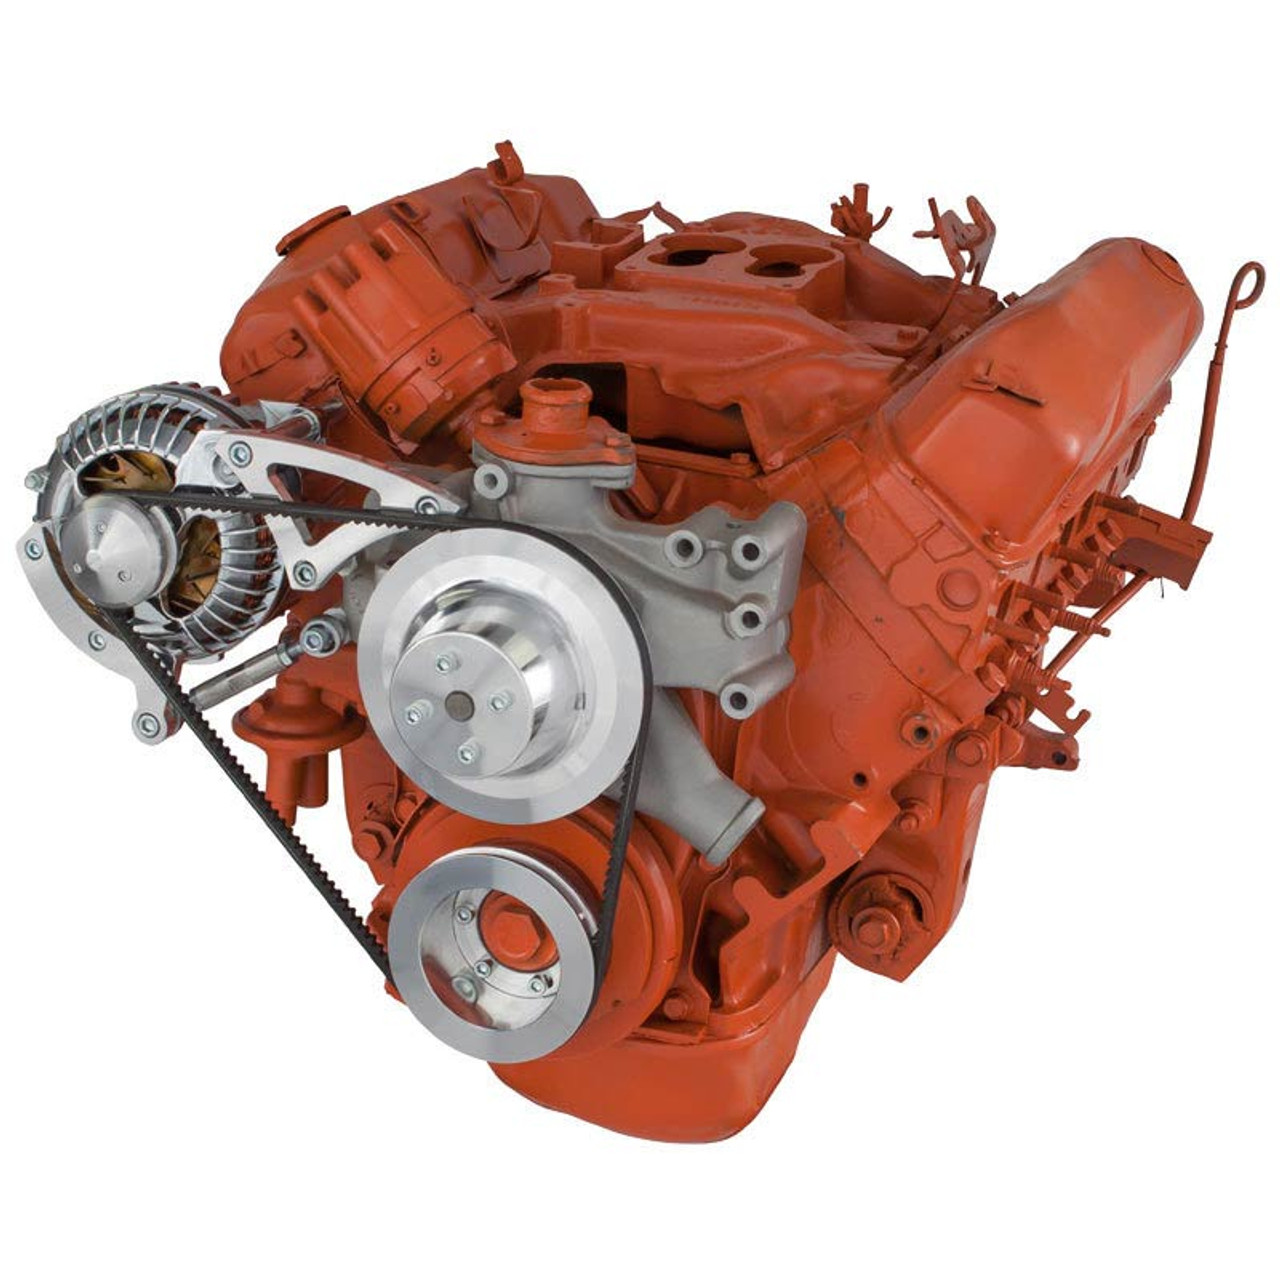 Chrysler 440 Pulley System